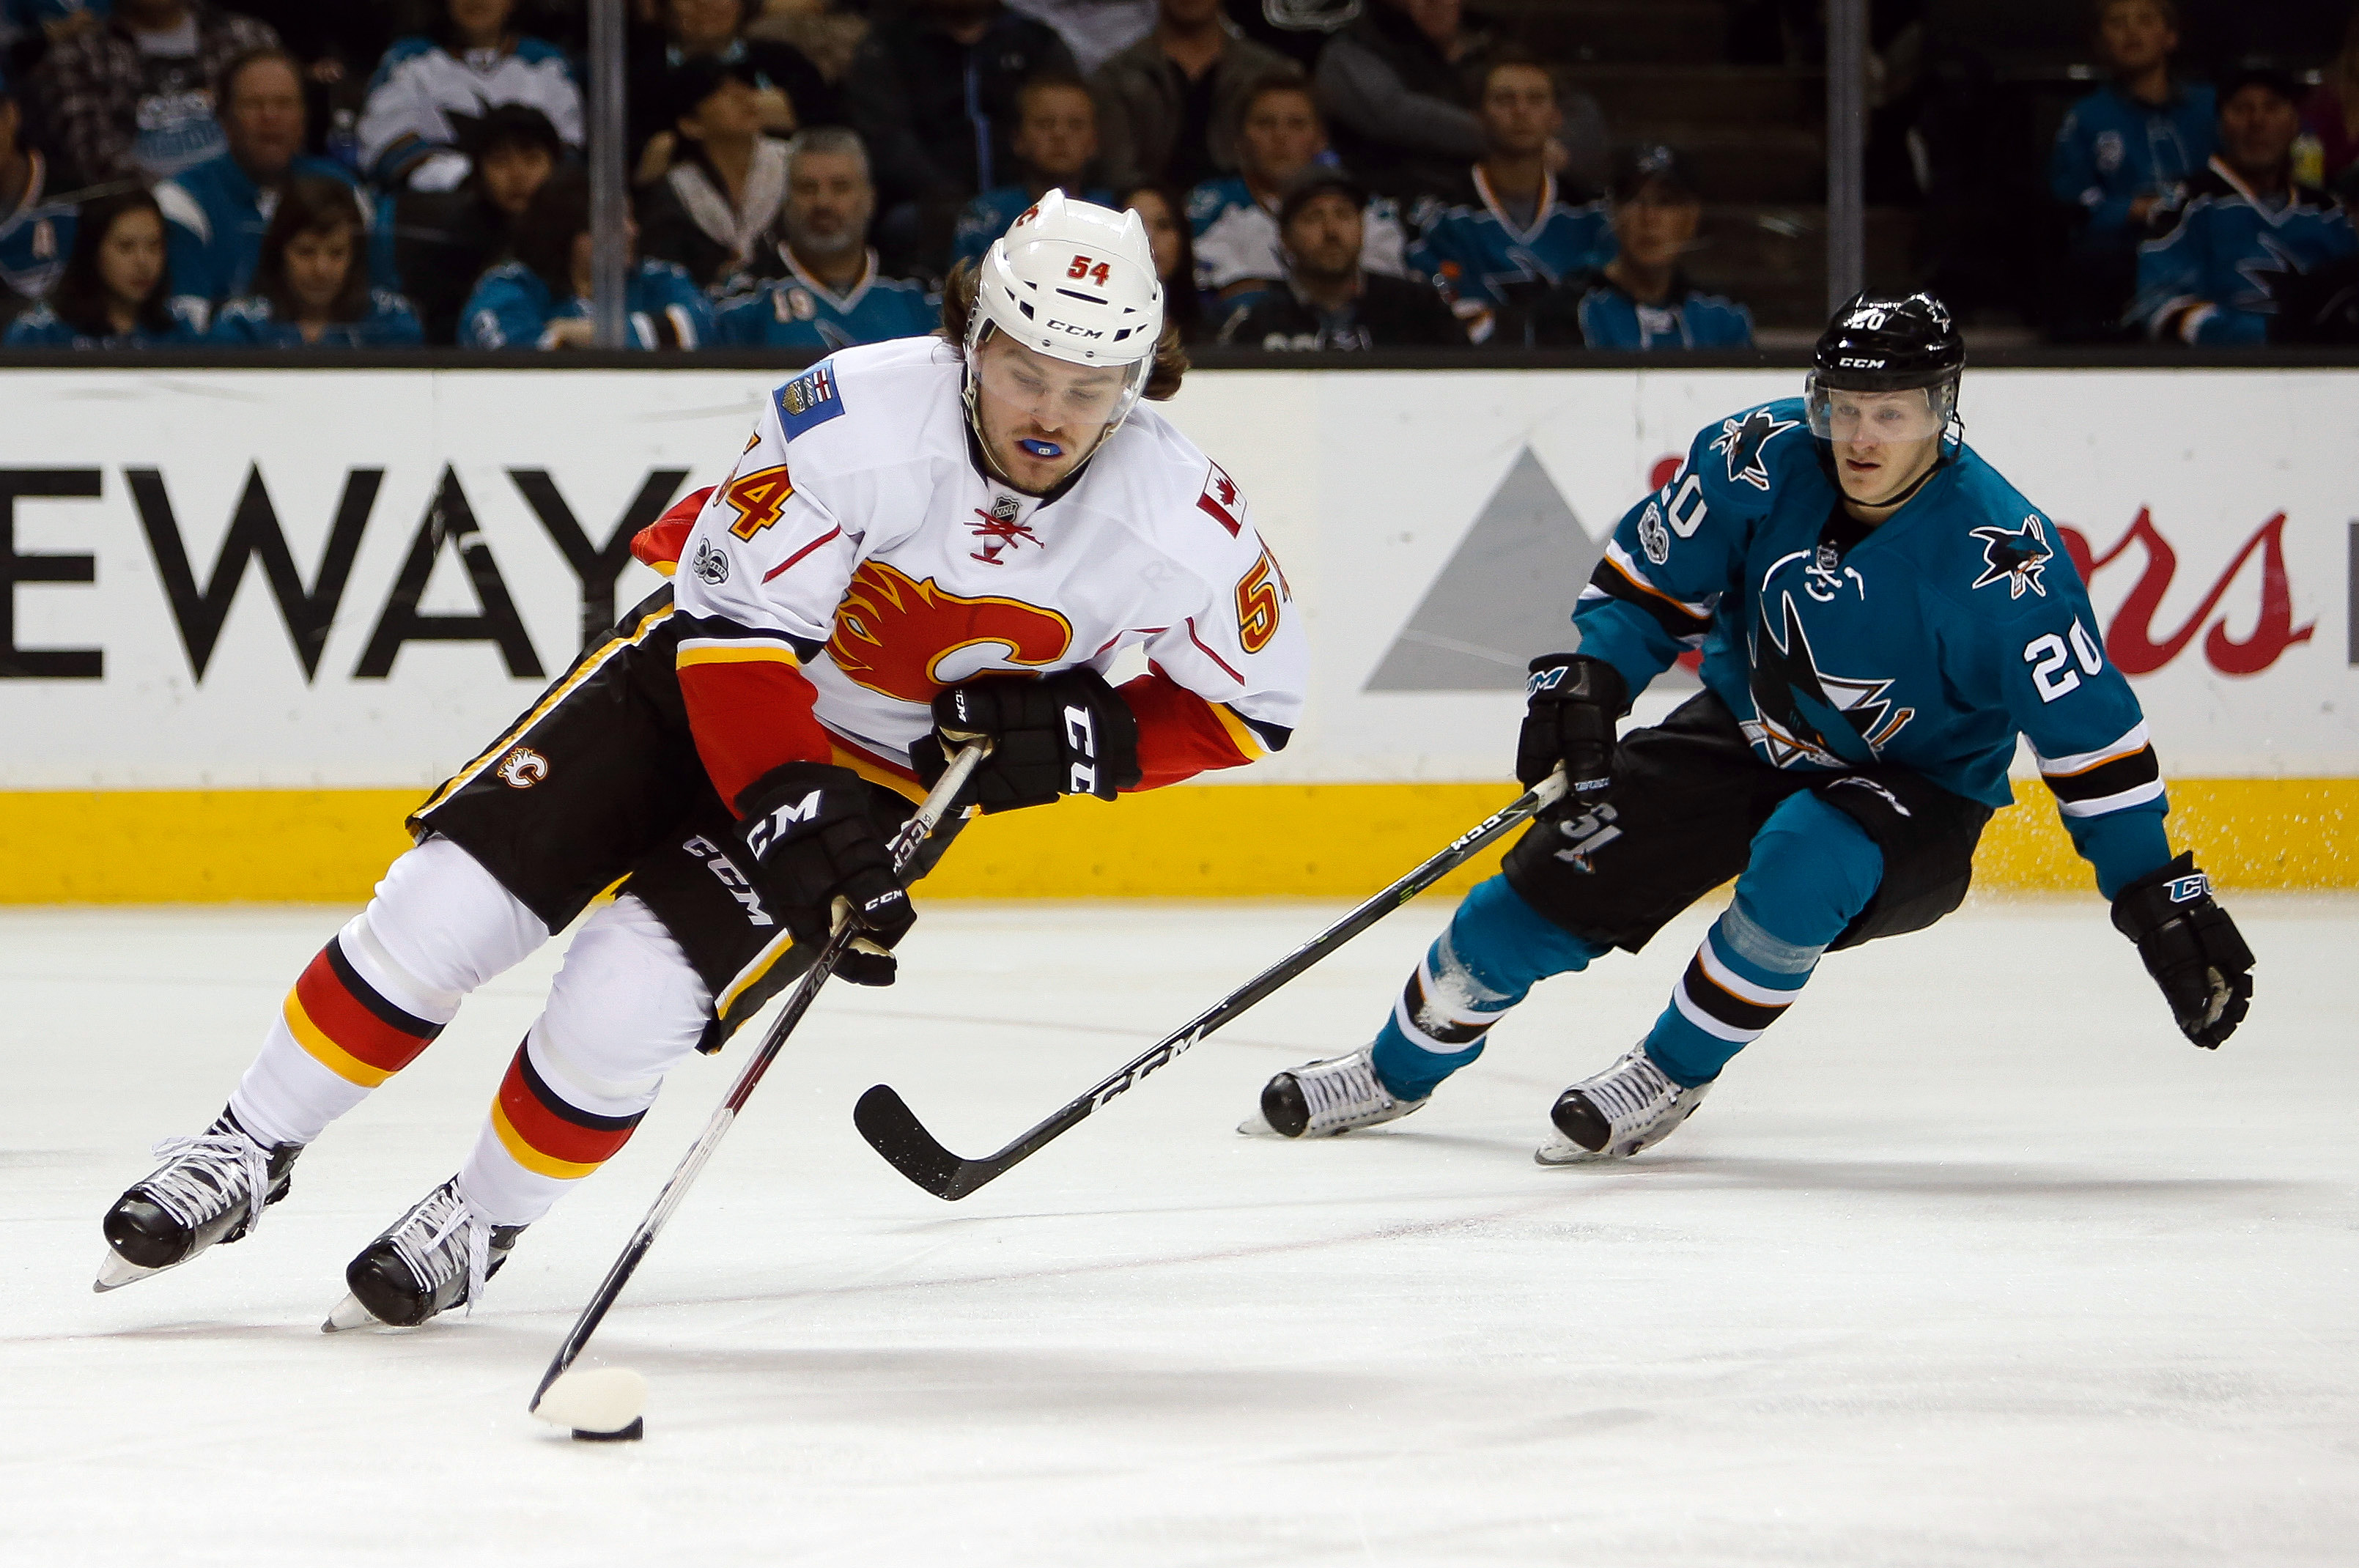 new arrival 99590 2e5a0 Calgary Flames: Why Trading for Alexander Ovechkin Makes Sense